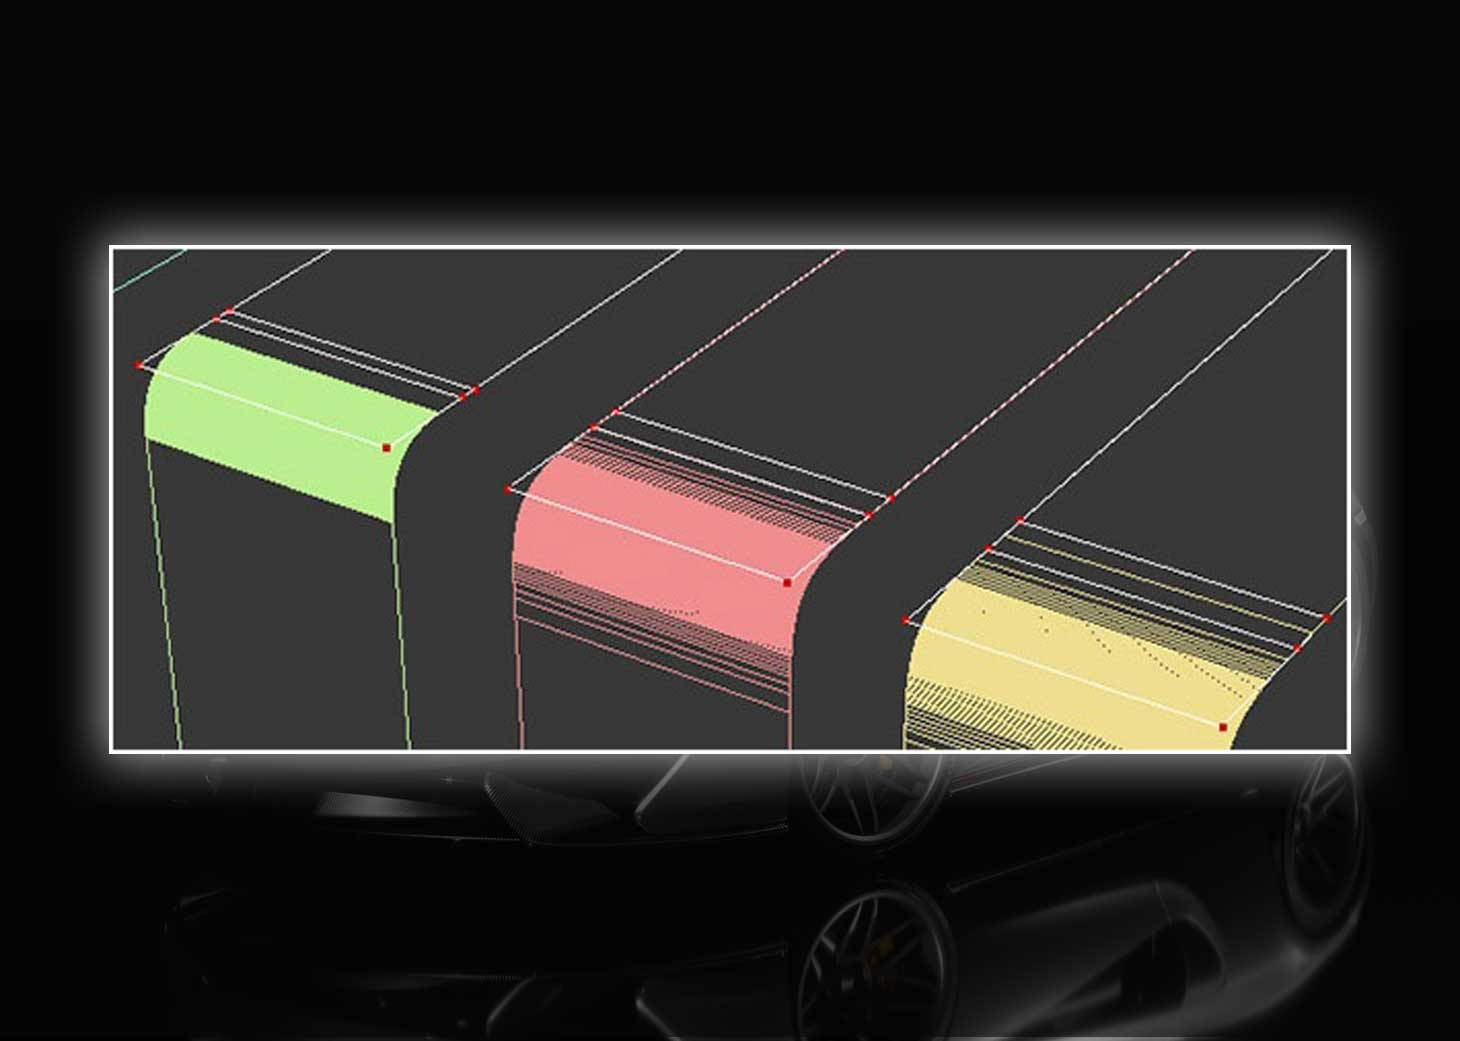 modeling using polygons car 3ds max maya7 - مدلسازی خودرو در تری دی مکس